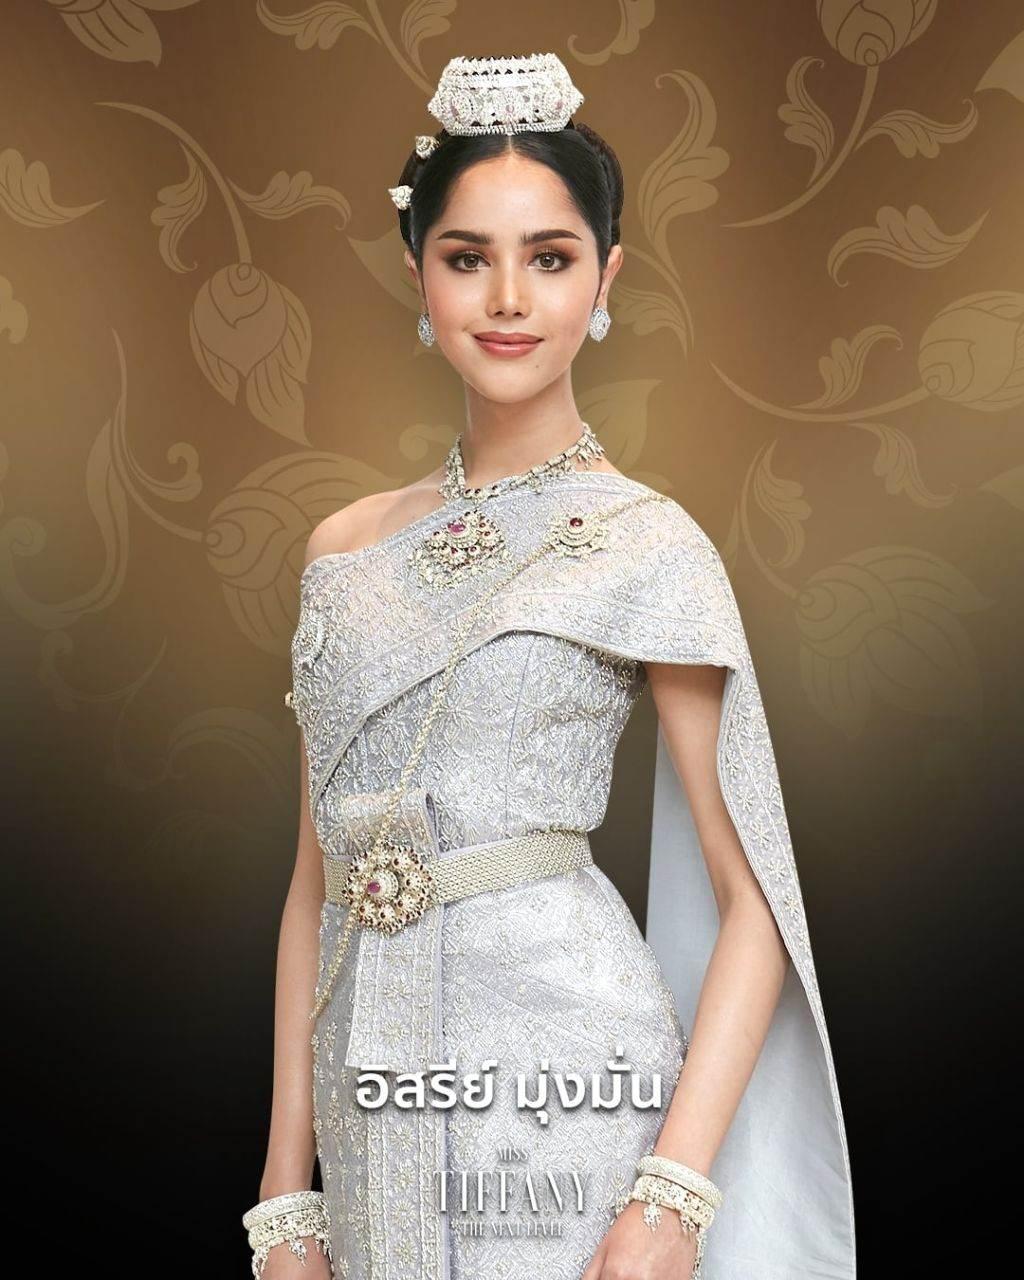 THAILAND 🇹🇭 | ชุดไทยจักรี by Miss Tiffany's Universe 2020